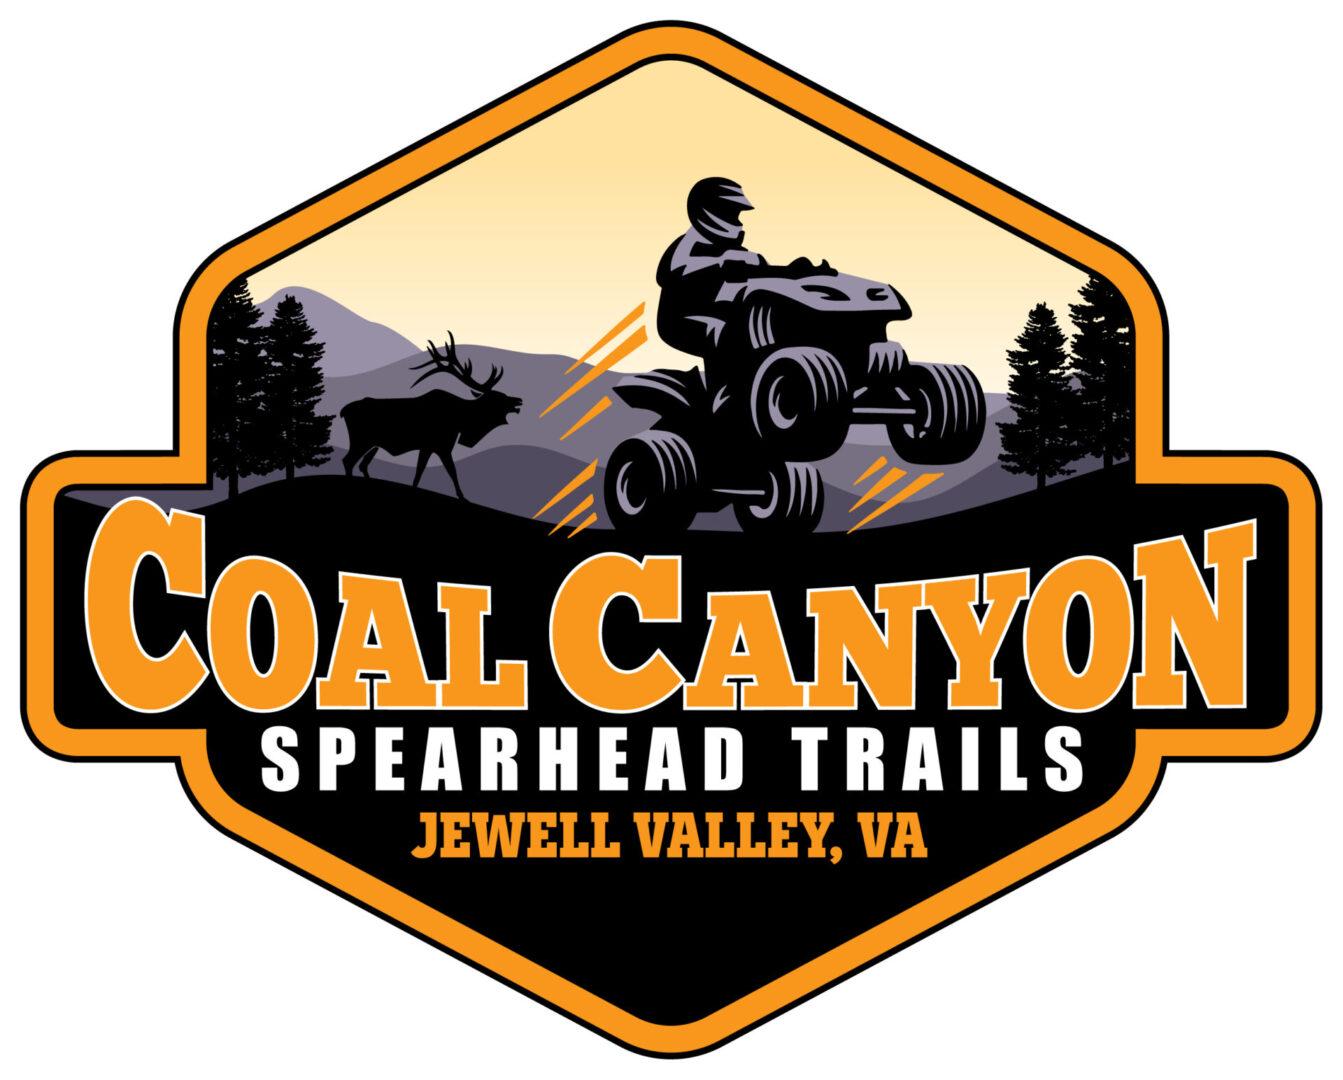 https://spearheadtrails.com/wp-content/uploads/2020/05/new-coal-canyon-JV-scaled.jpg